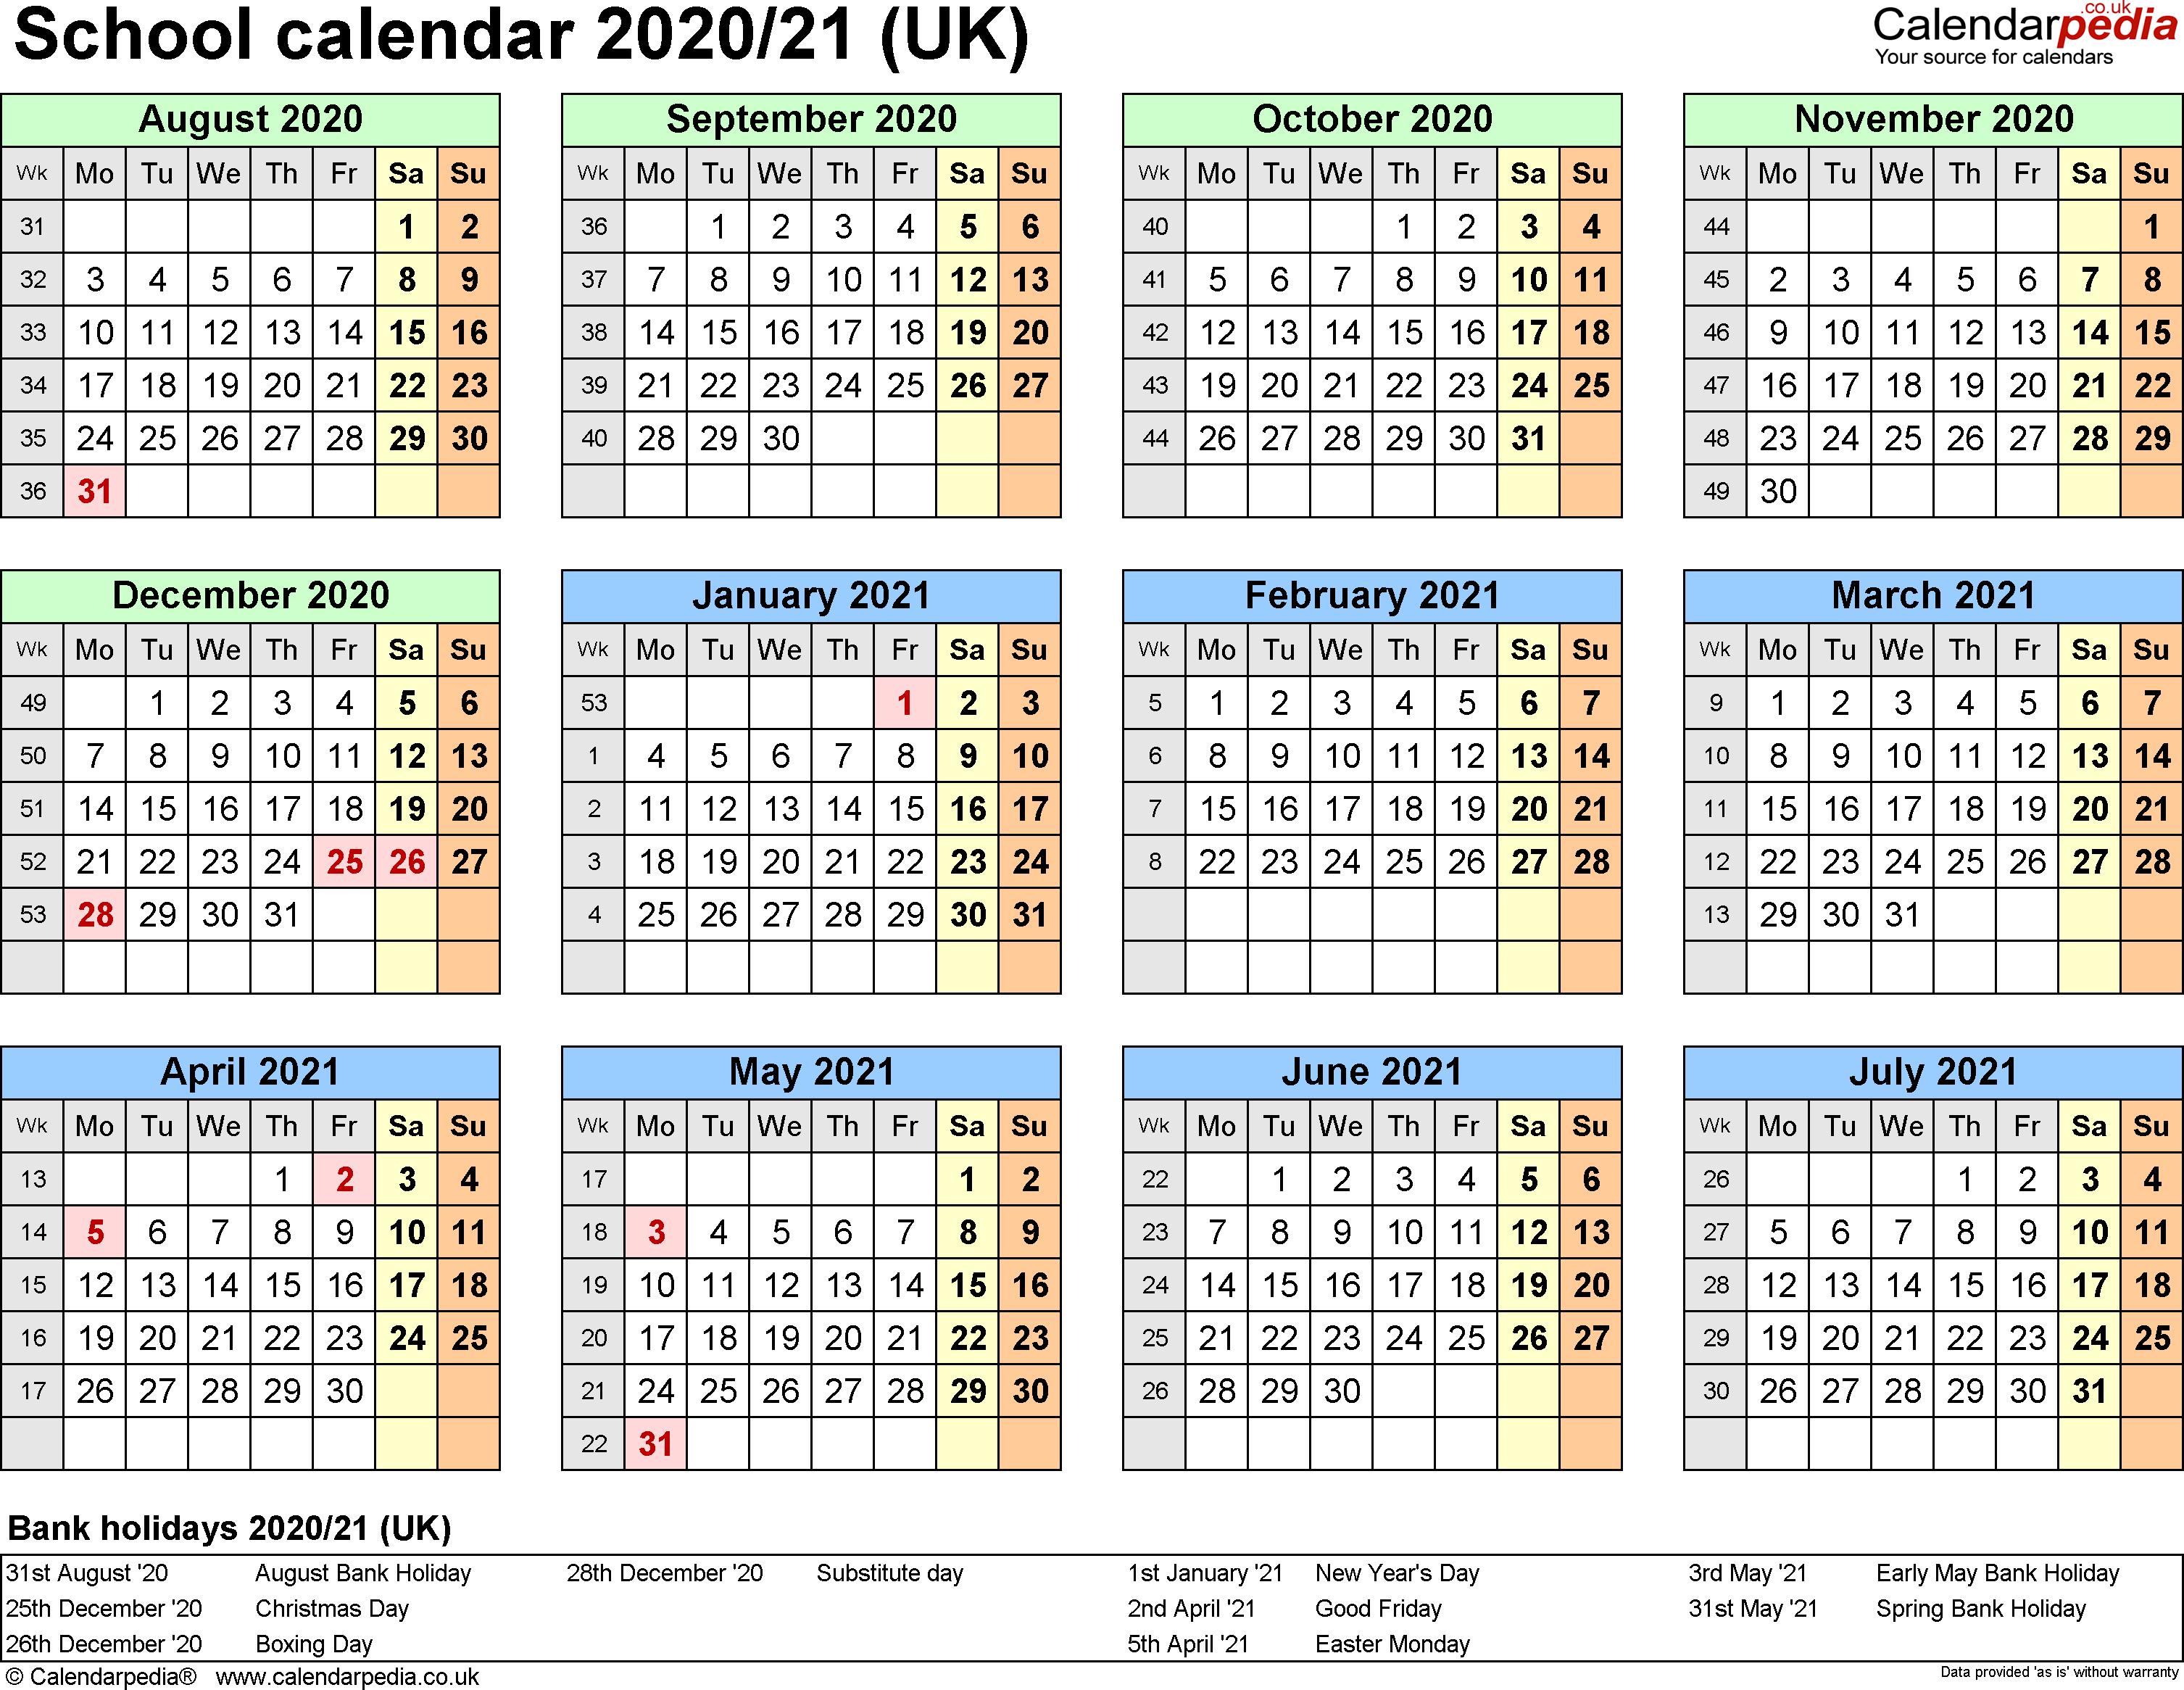 School Calendars 2020/2021 As Free Printable Excel Templates